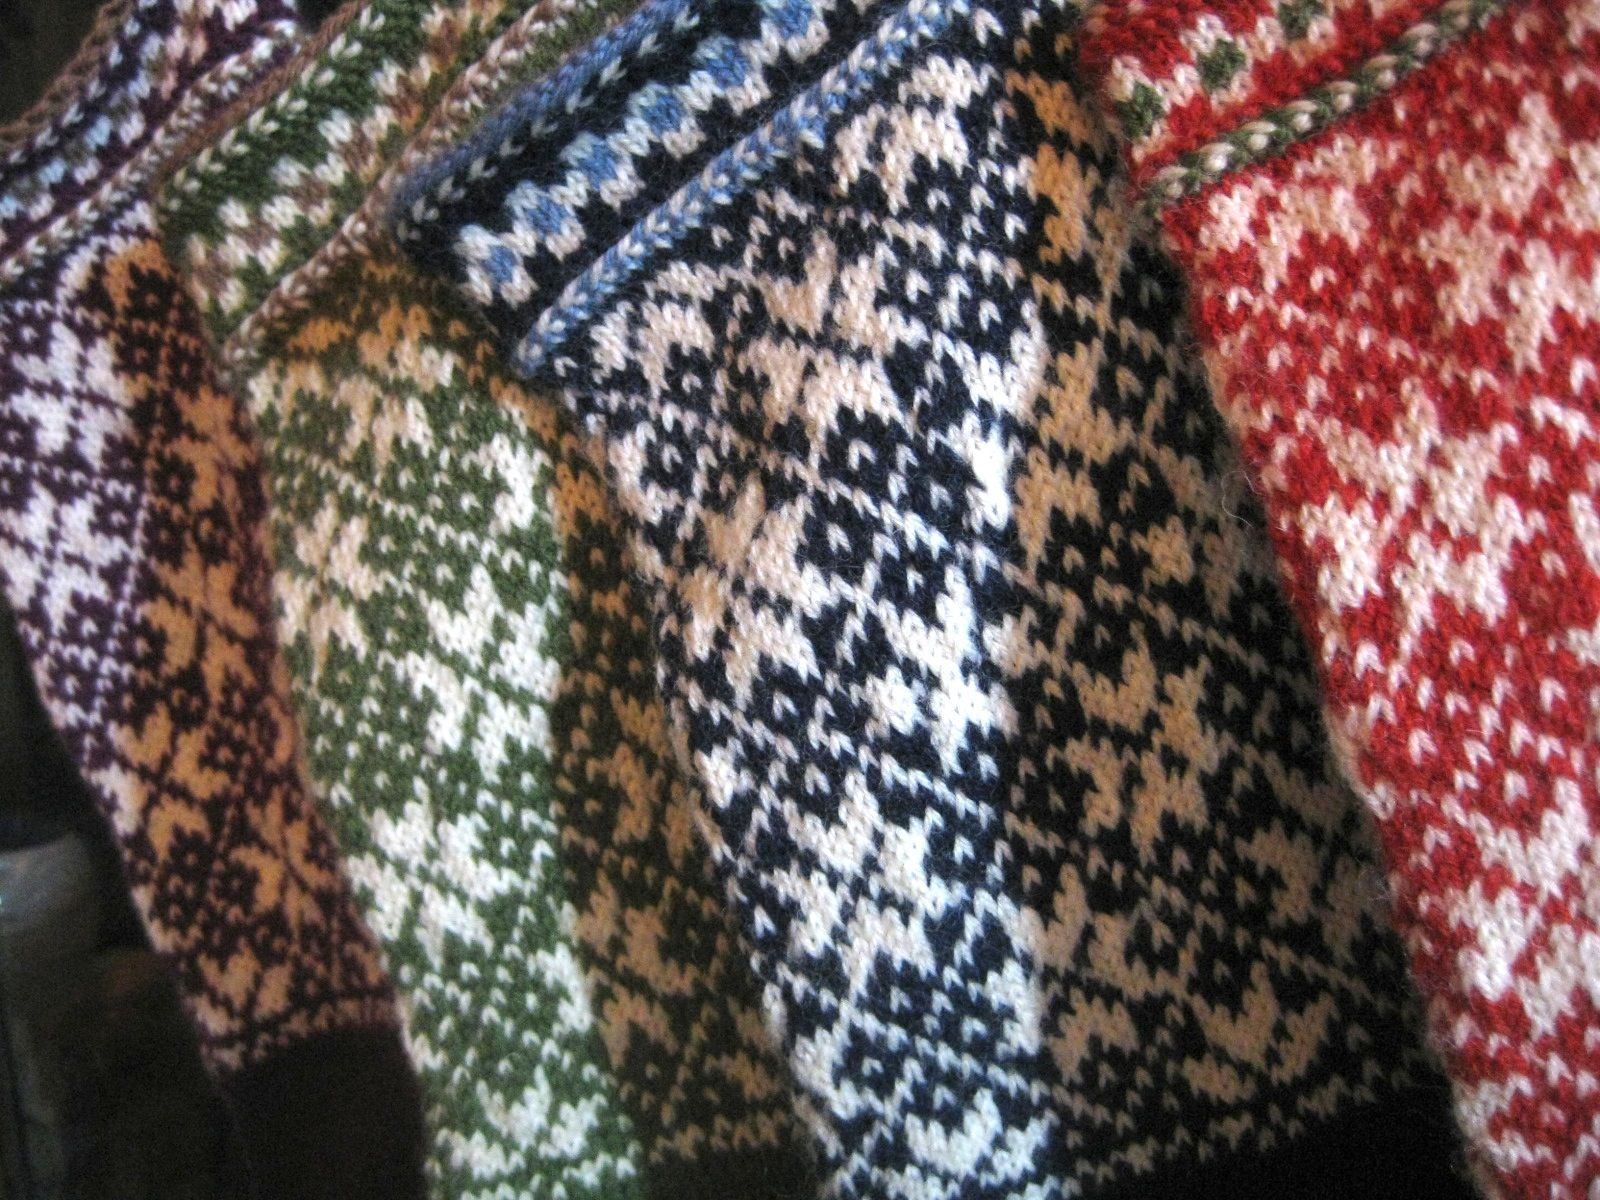 My familys handknit christmas stockings pattern is christmas in my familys handknit christmas stockings pattern is christmas in tallinn by nancy bush bankloansurffo Choice Image